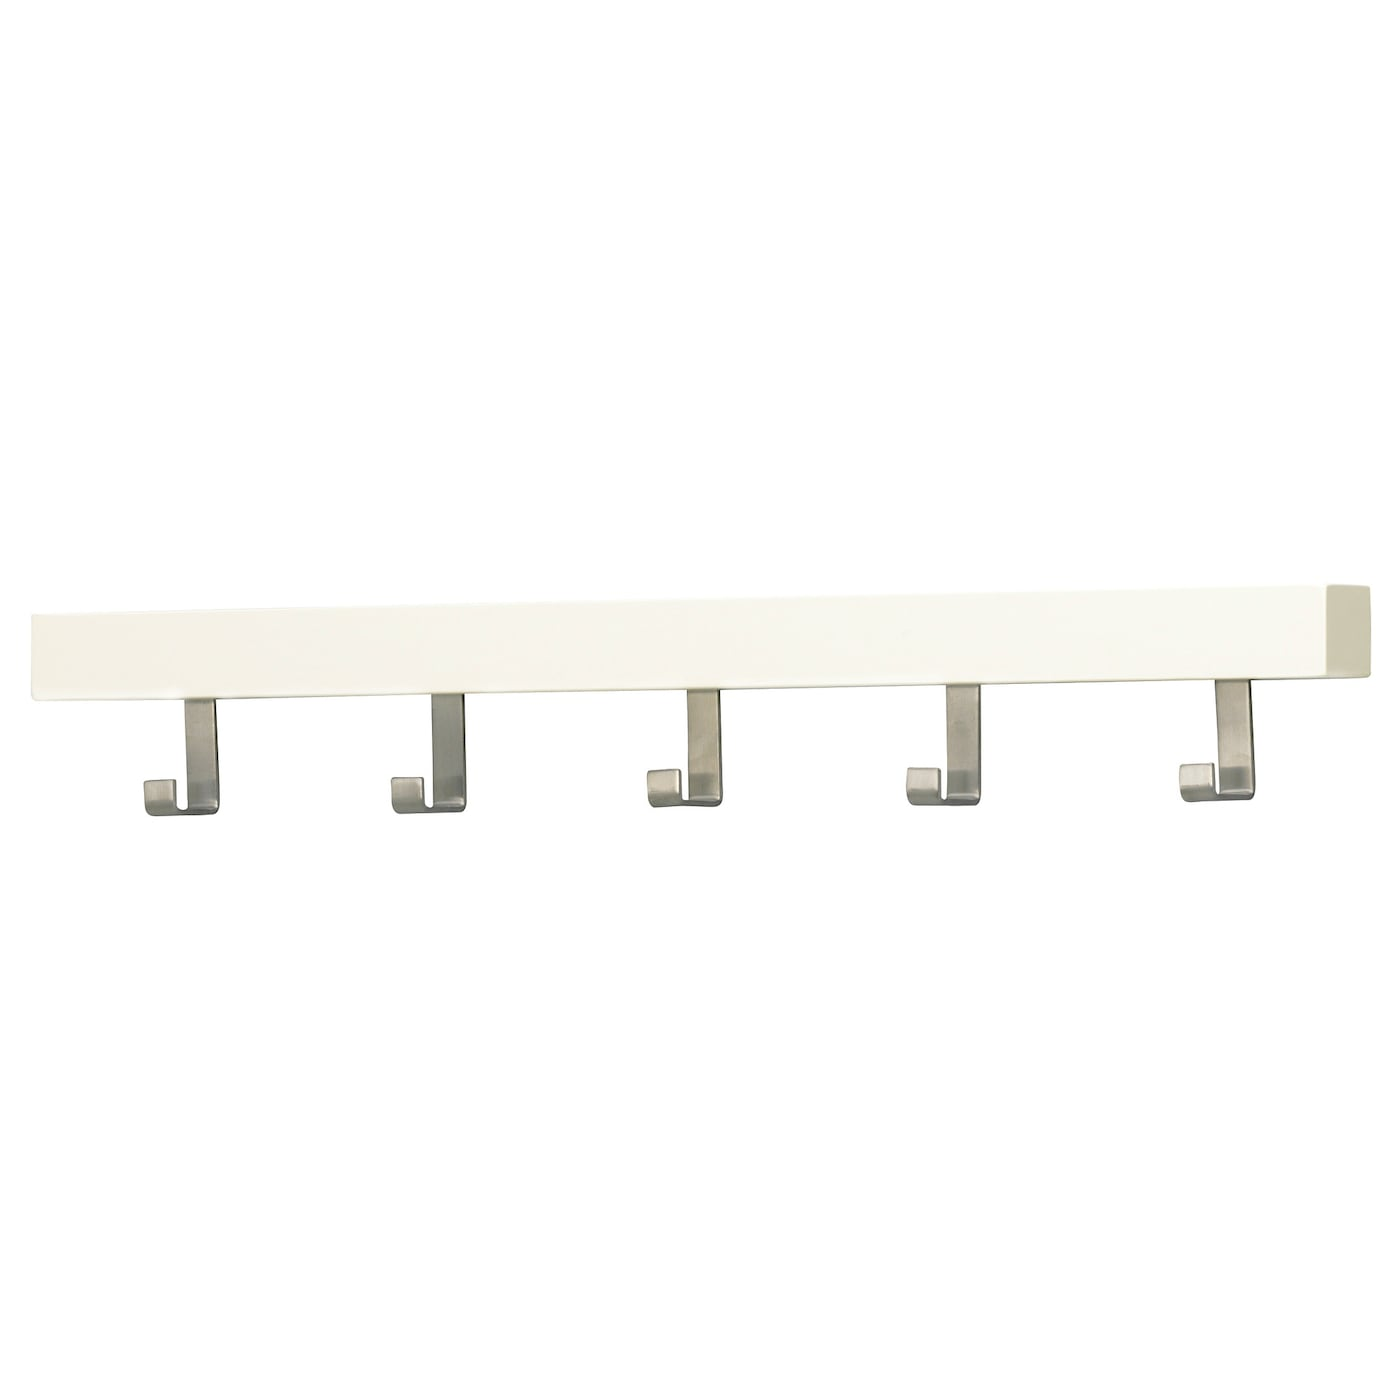 Tjusig pat re pour porte mur blanc 60 cm ikea for Porte 60 cm ikea